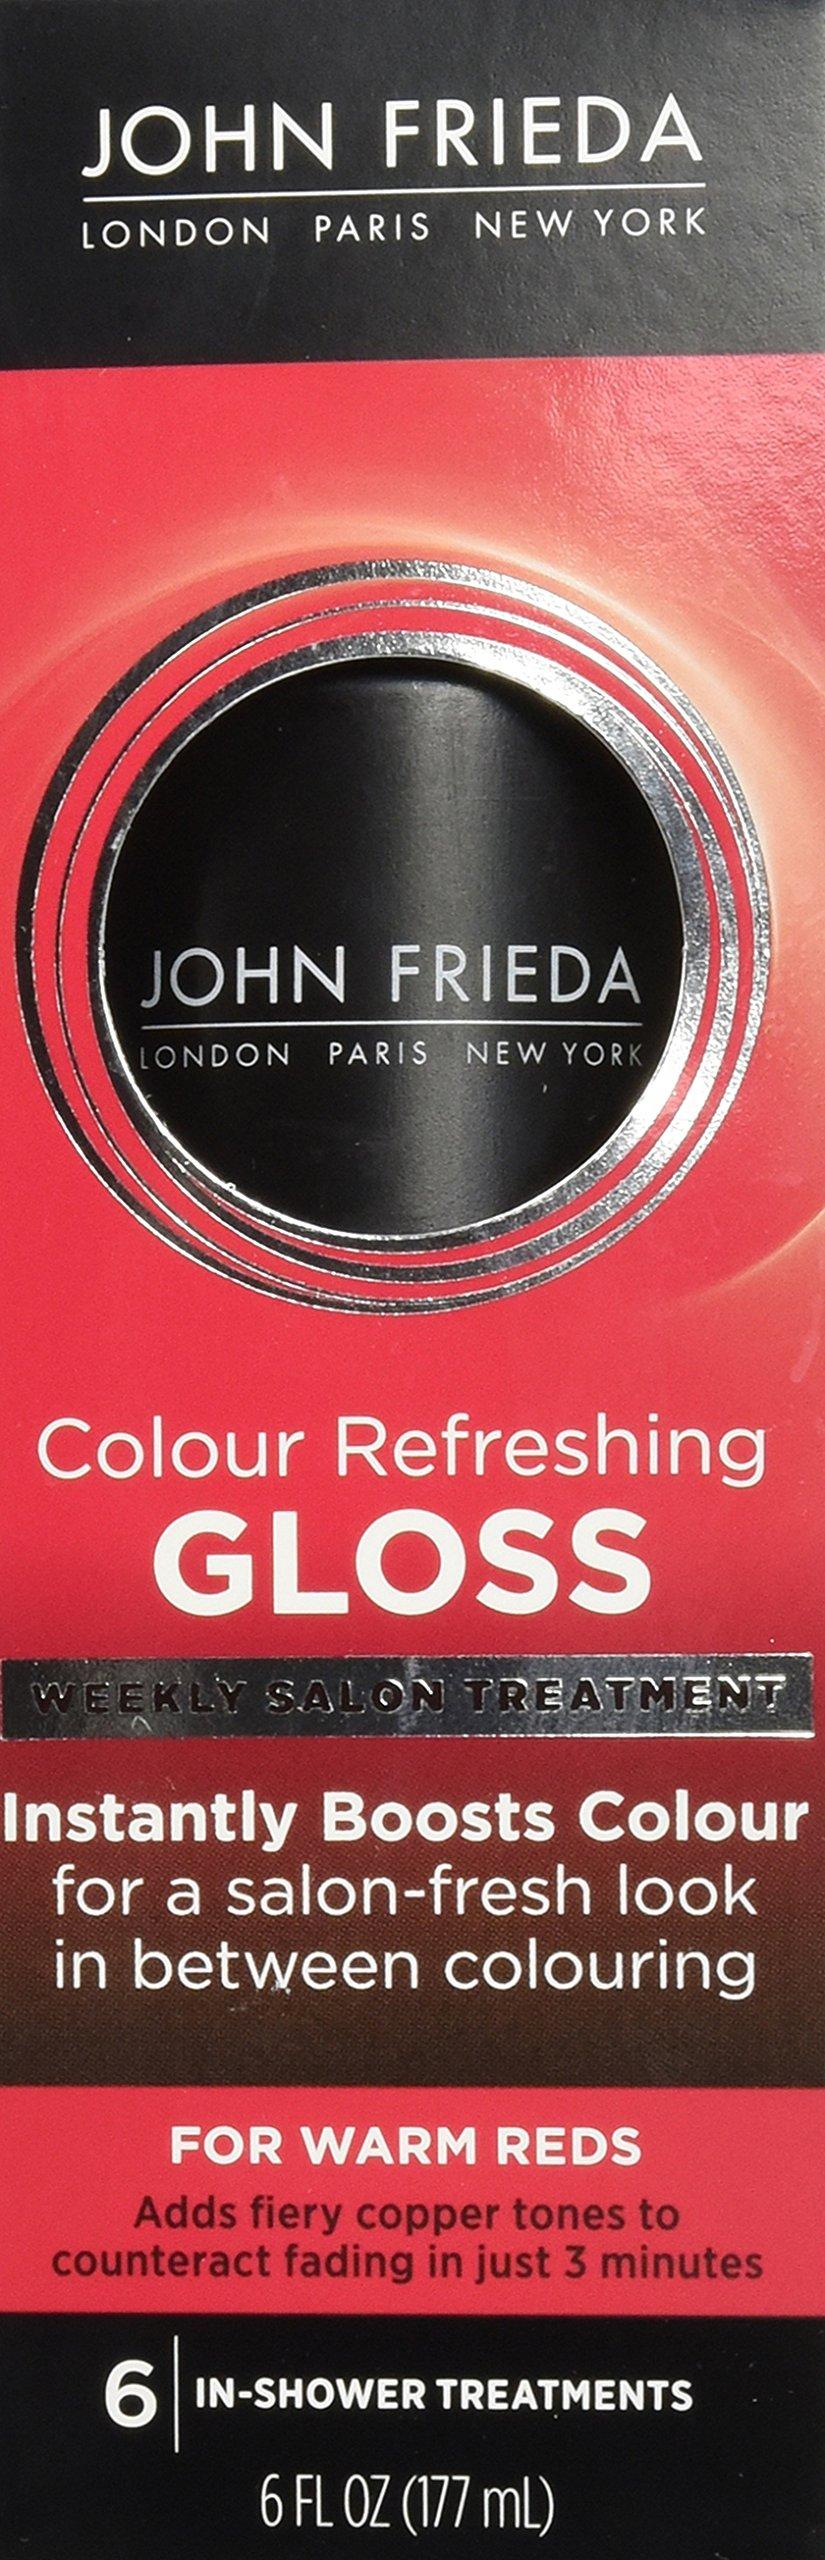 John Frieda Colour Refreshing Gloss, Warm Red, 6 Ounce by John Frieda PFC (Image #4)